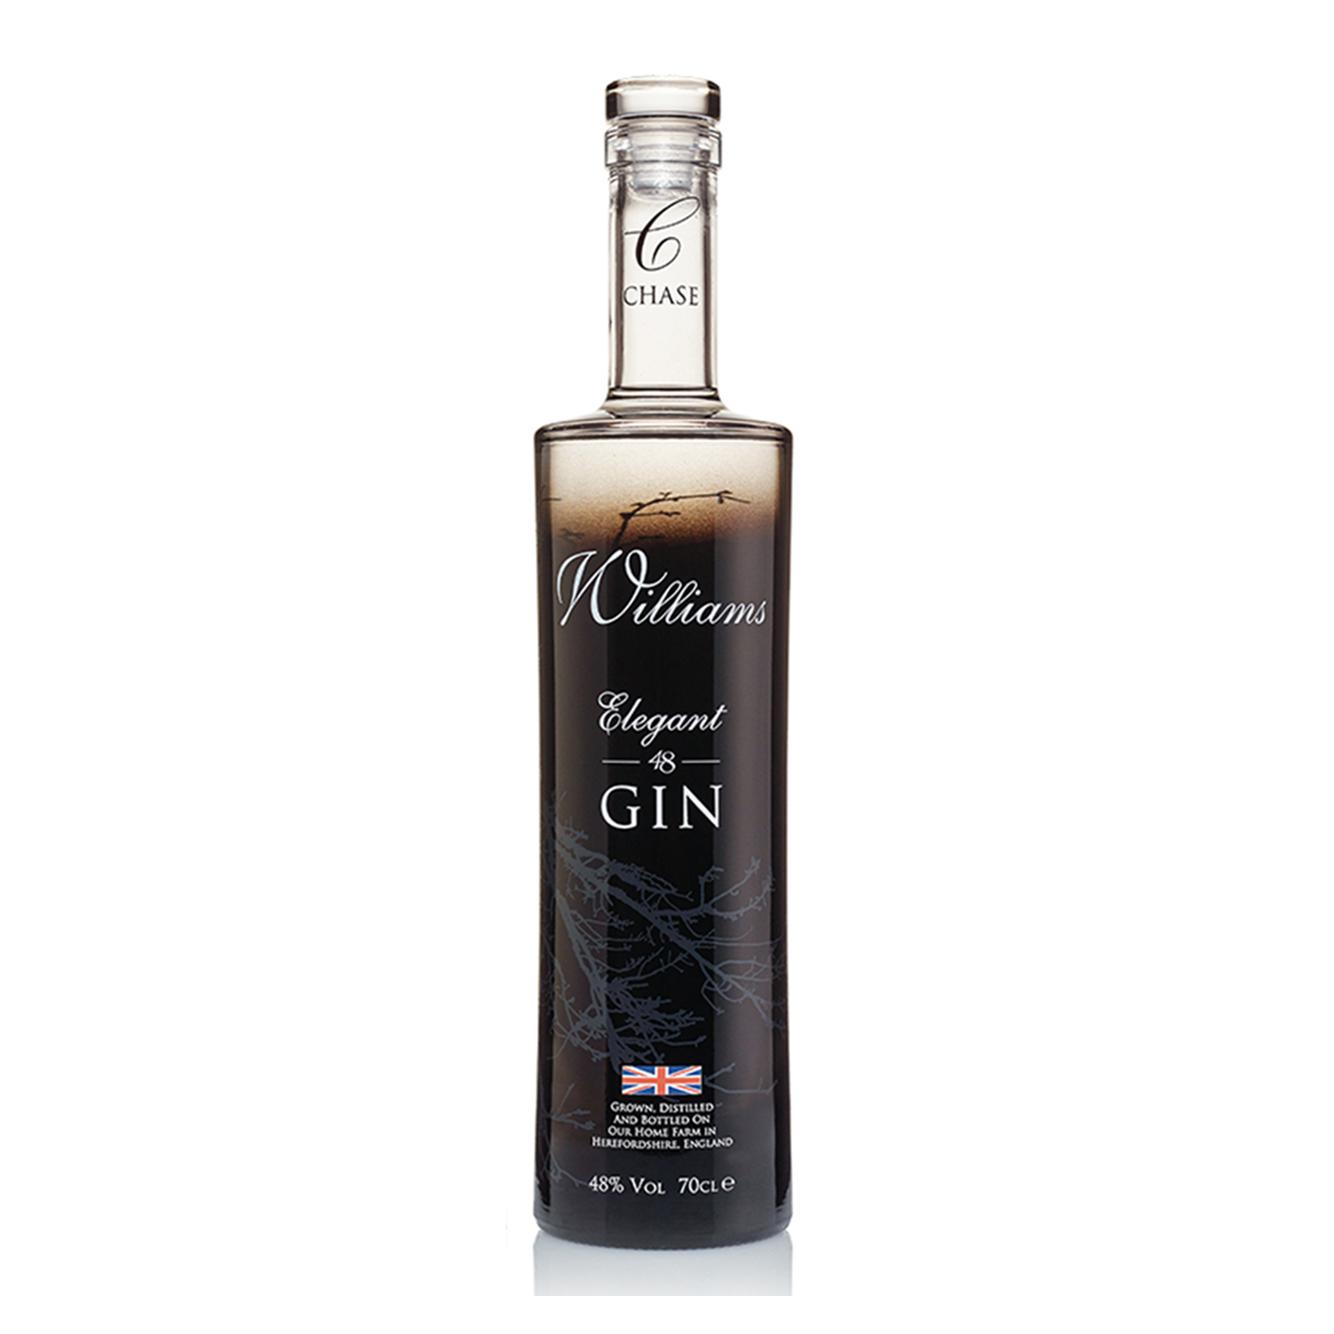 William Chase Elegant 48 Gin